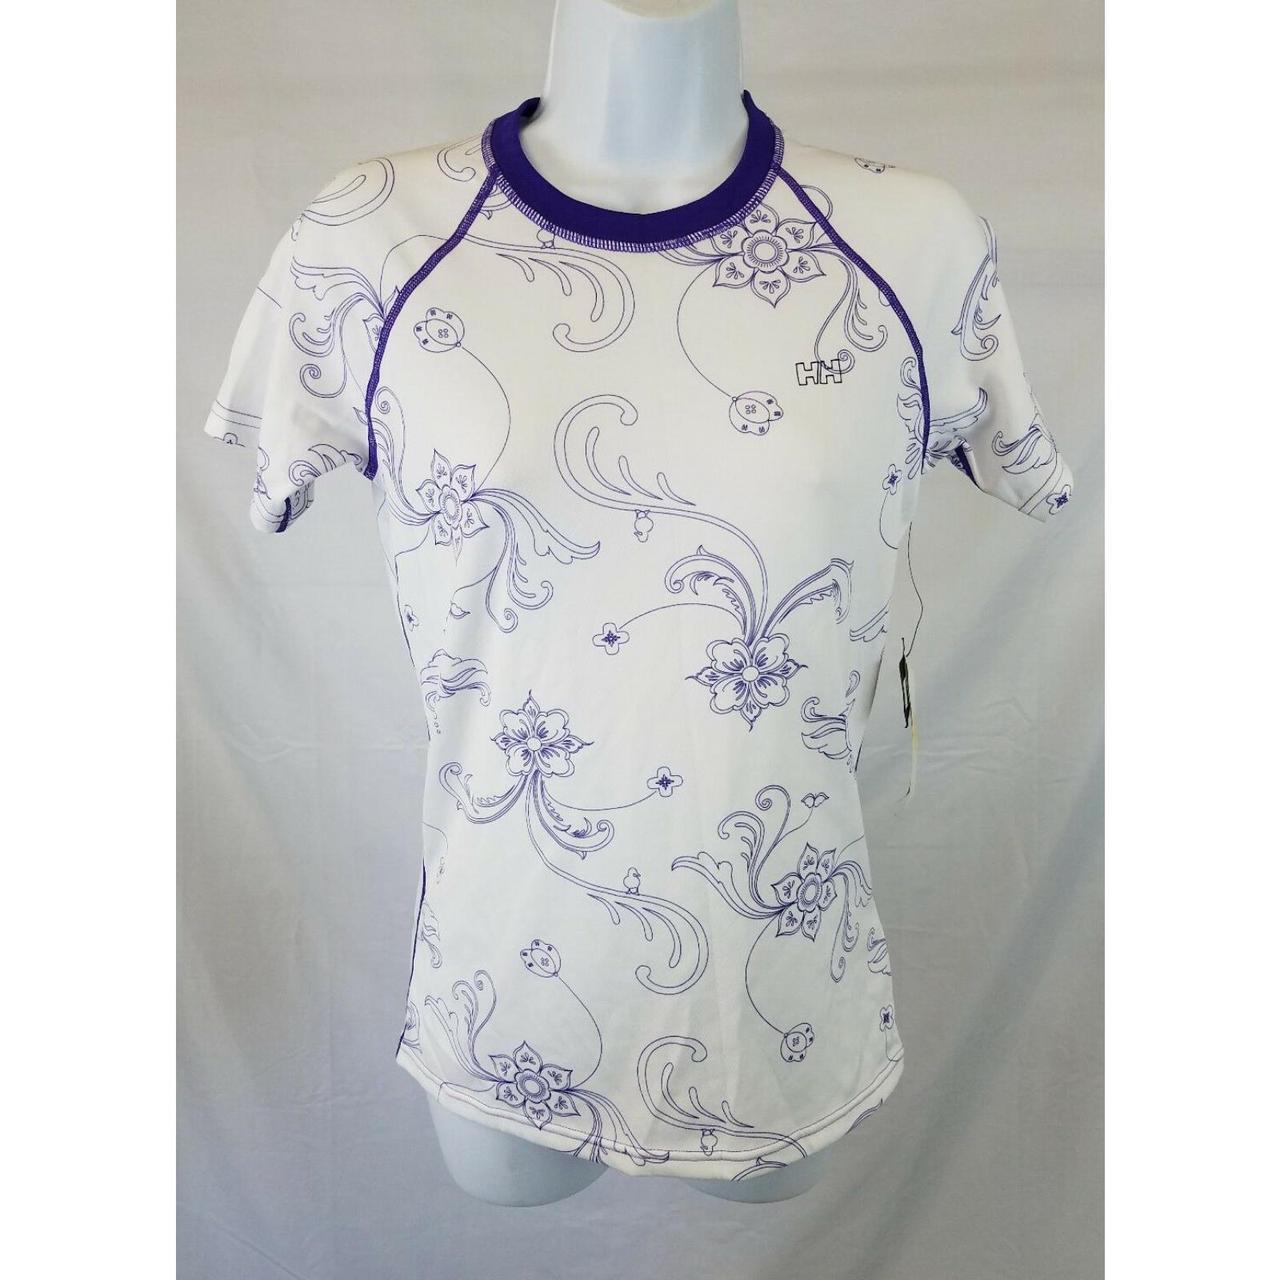 Product Image 1 - Helly Hansen Womens Training Shirt